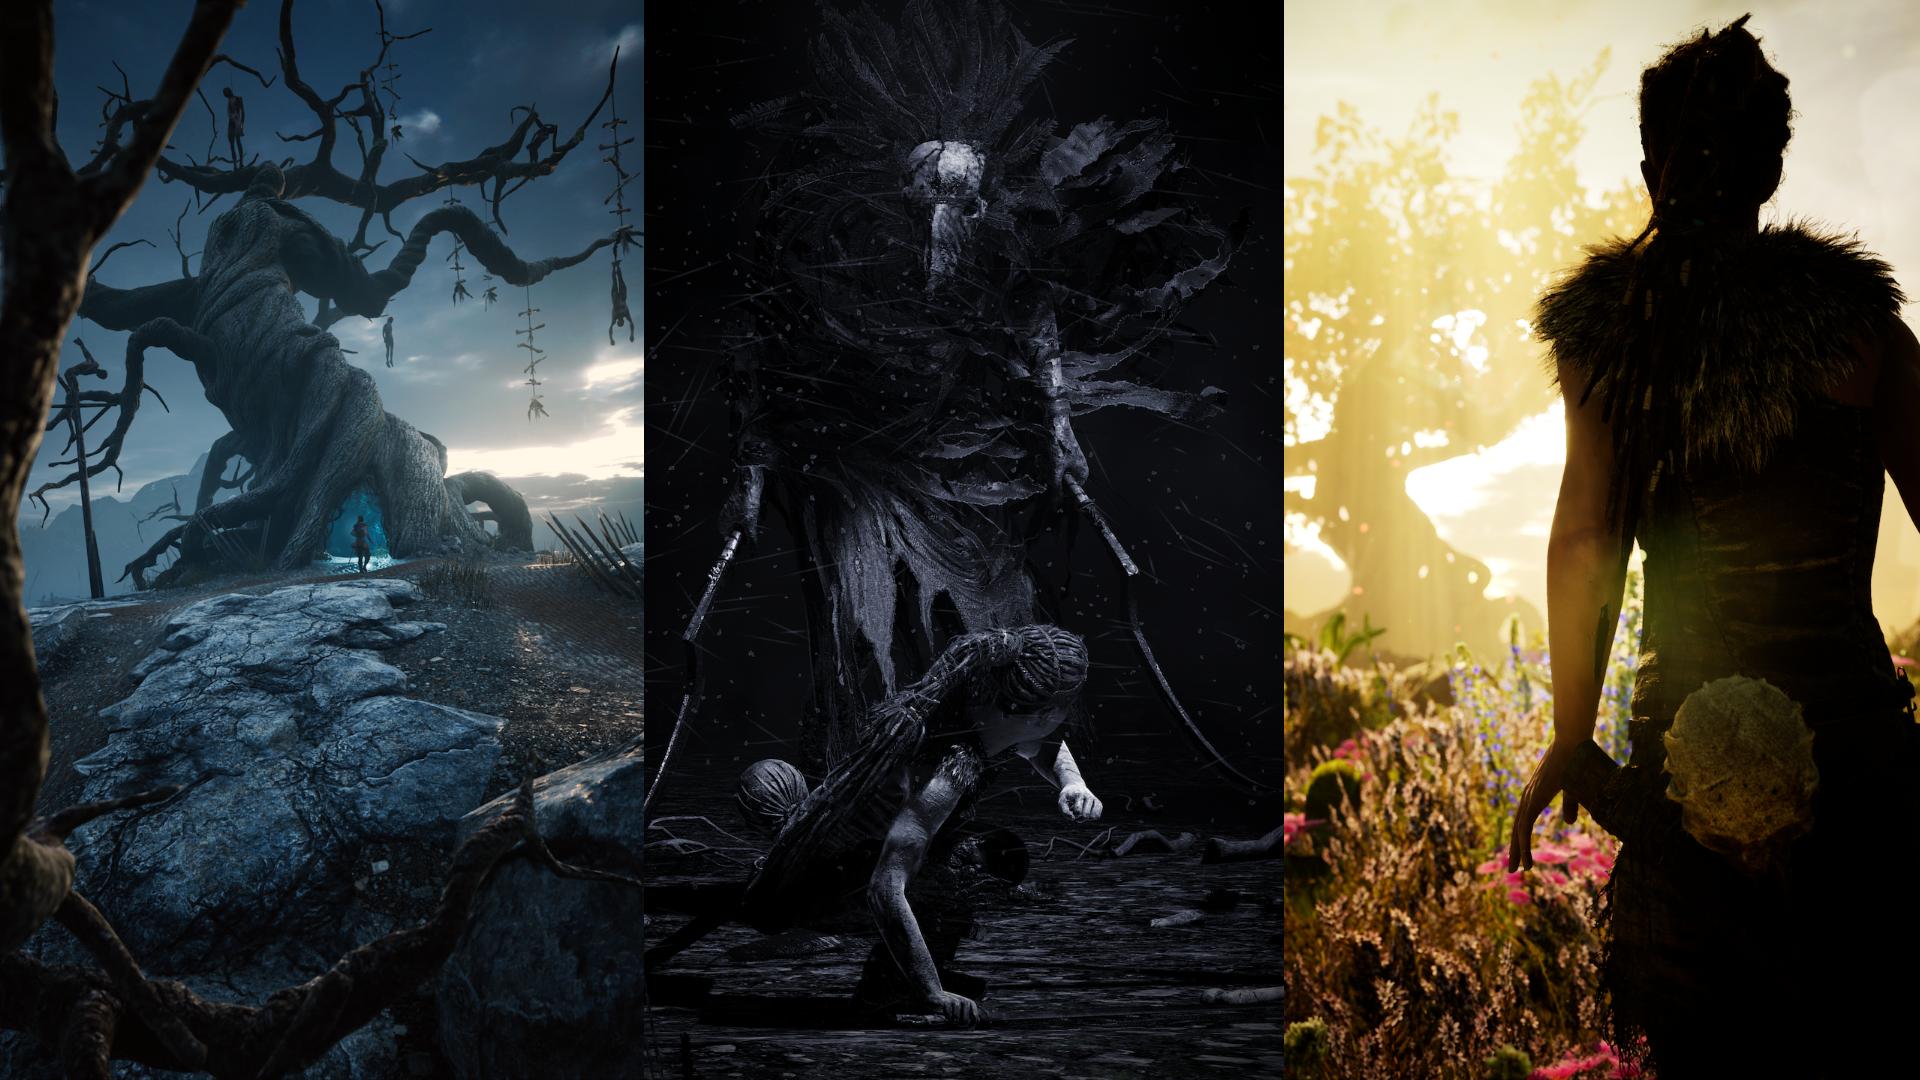 Wallpaper Hellblade Senuas Sacrifice Video Games